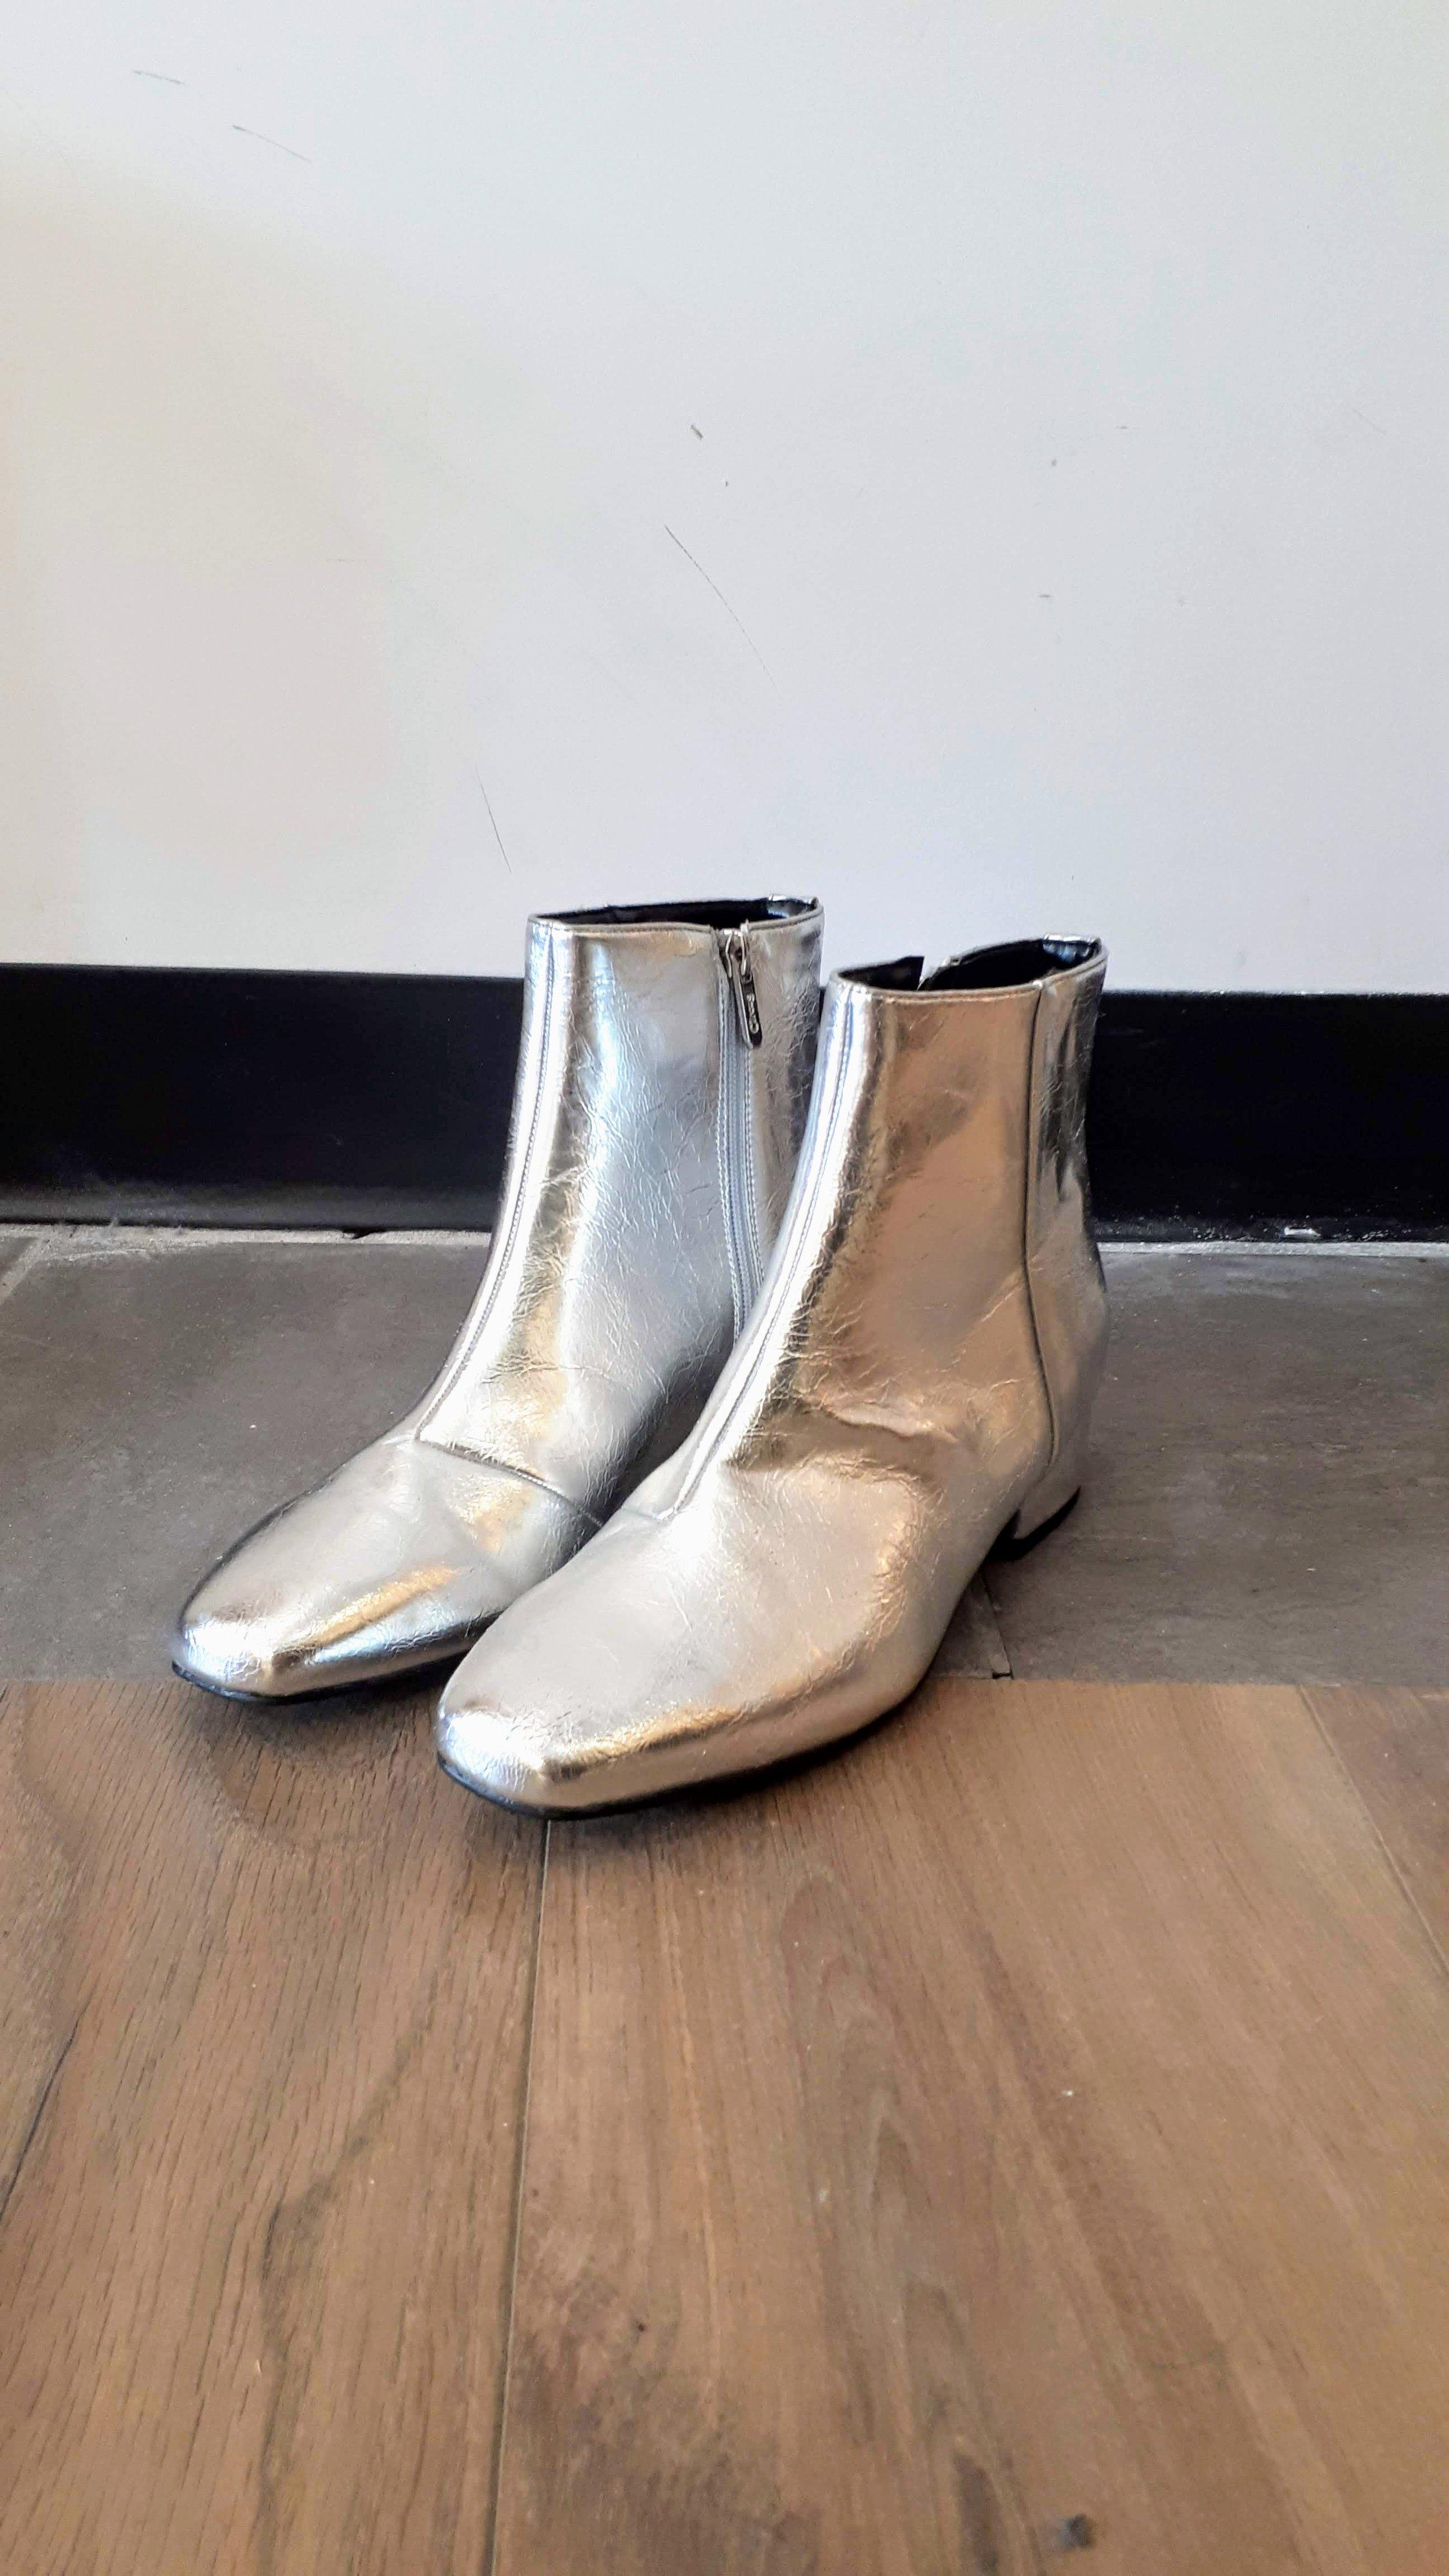 Sam Edelman boots; Size 8.5, $52